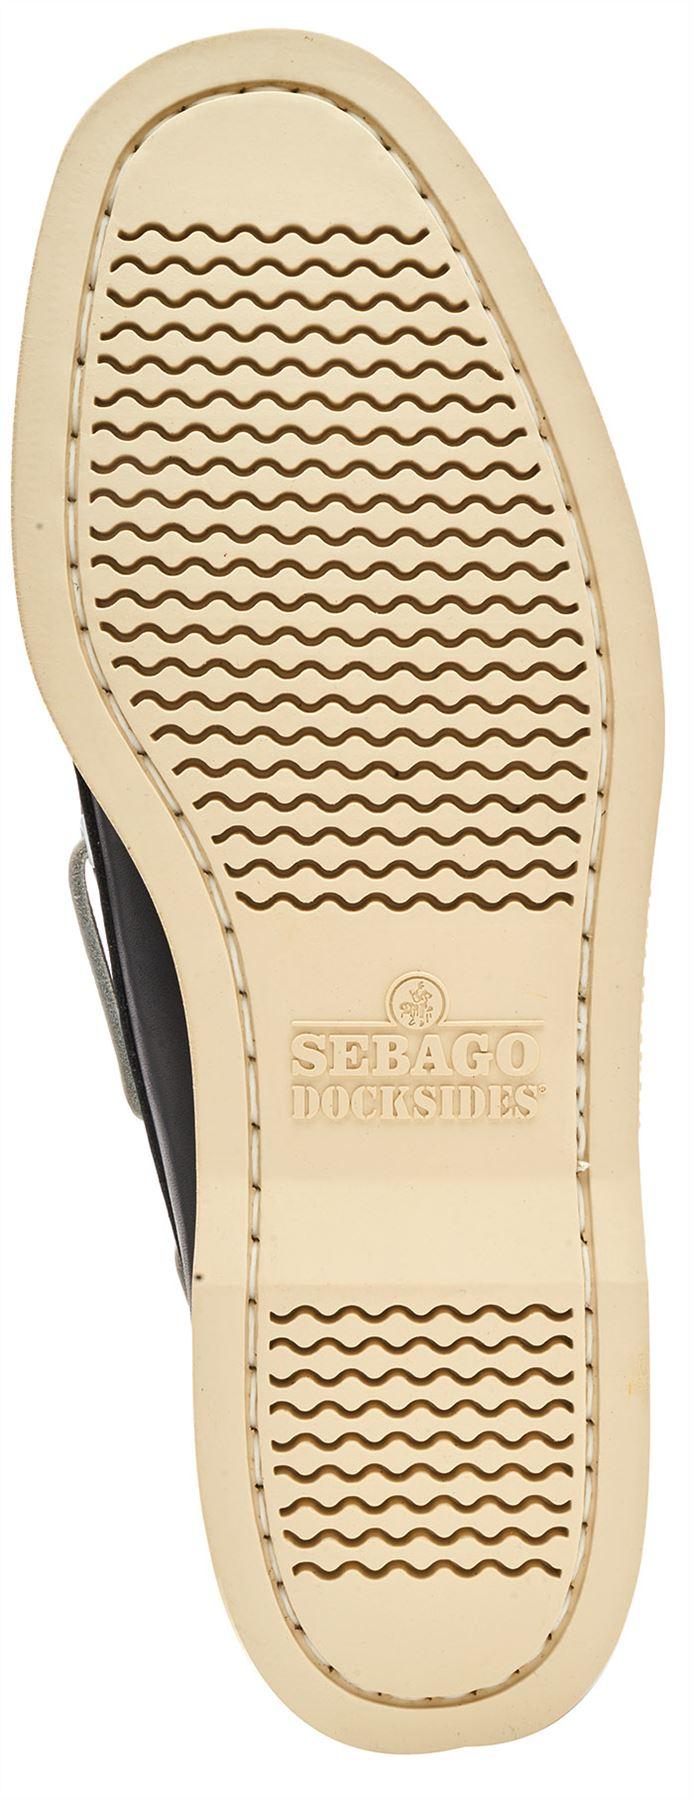 Sebago-Docksides-NBK-Suede-Boat-Deck-Shoes-in-Navy-Blue-amp-Coral-amp-Dark-Brown thumbnail 25